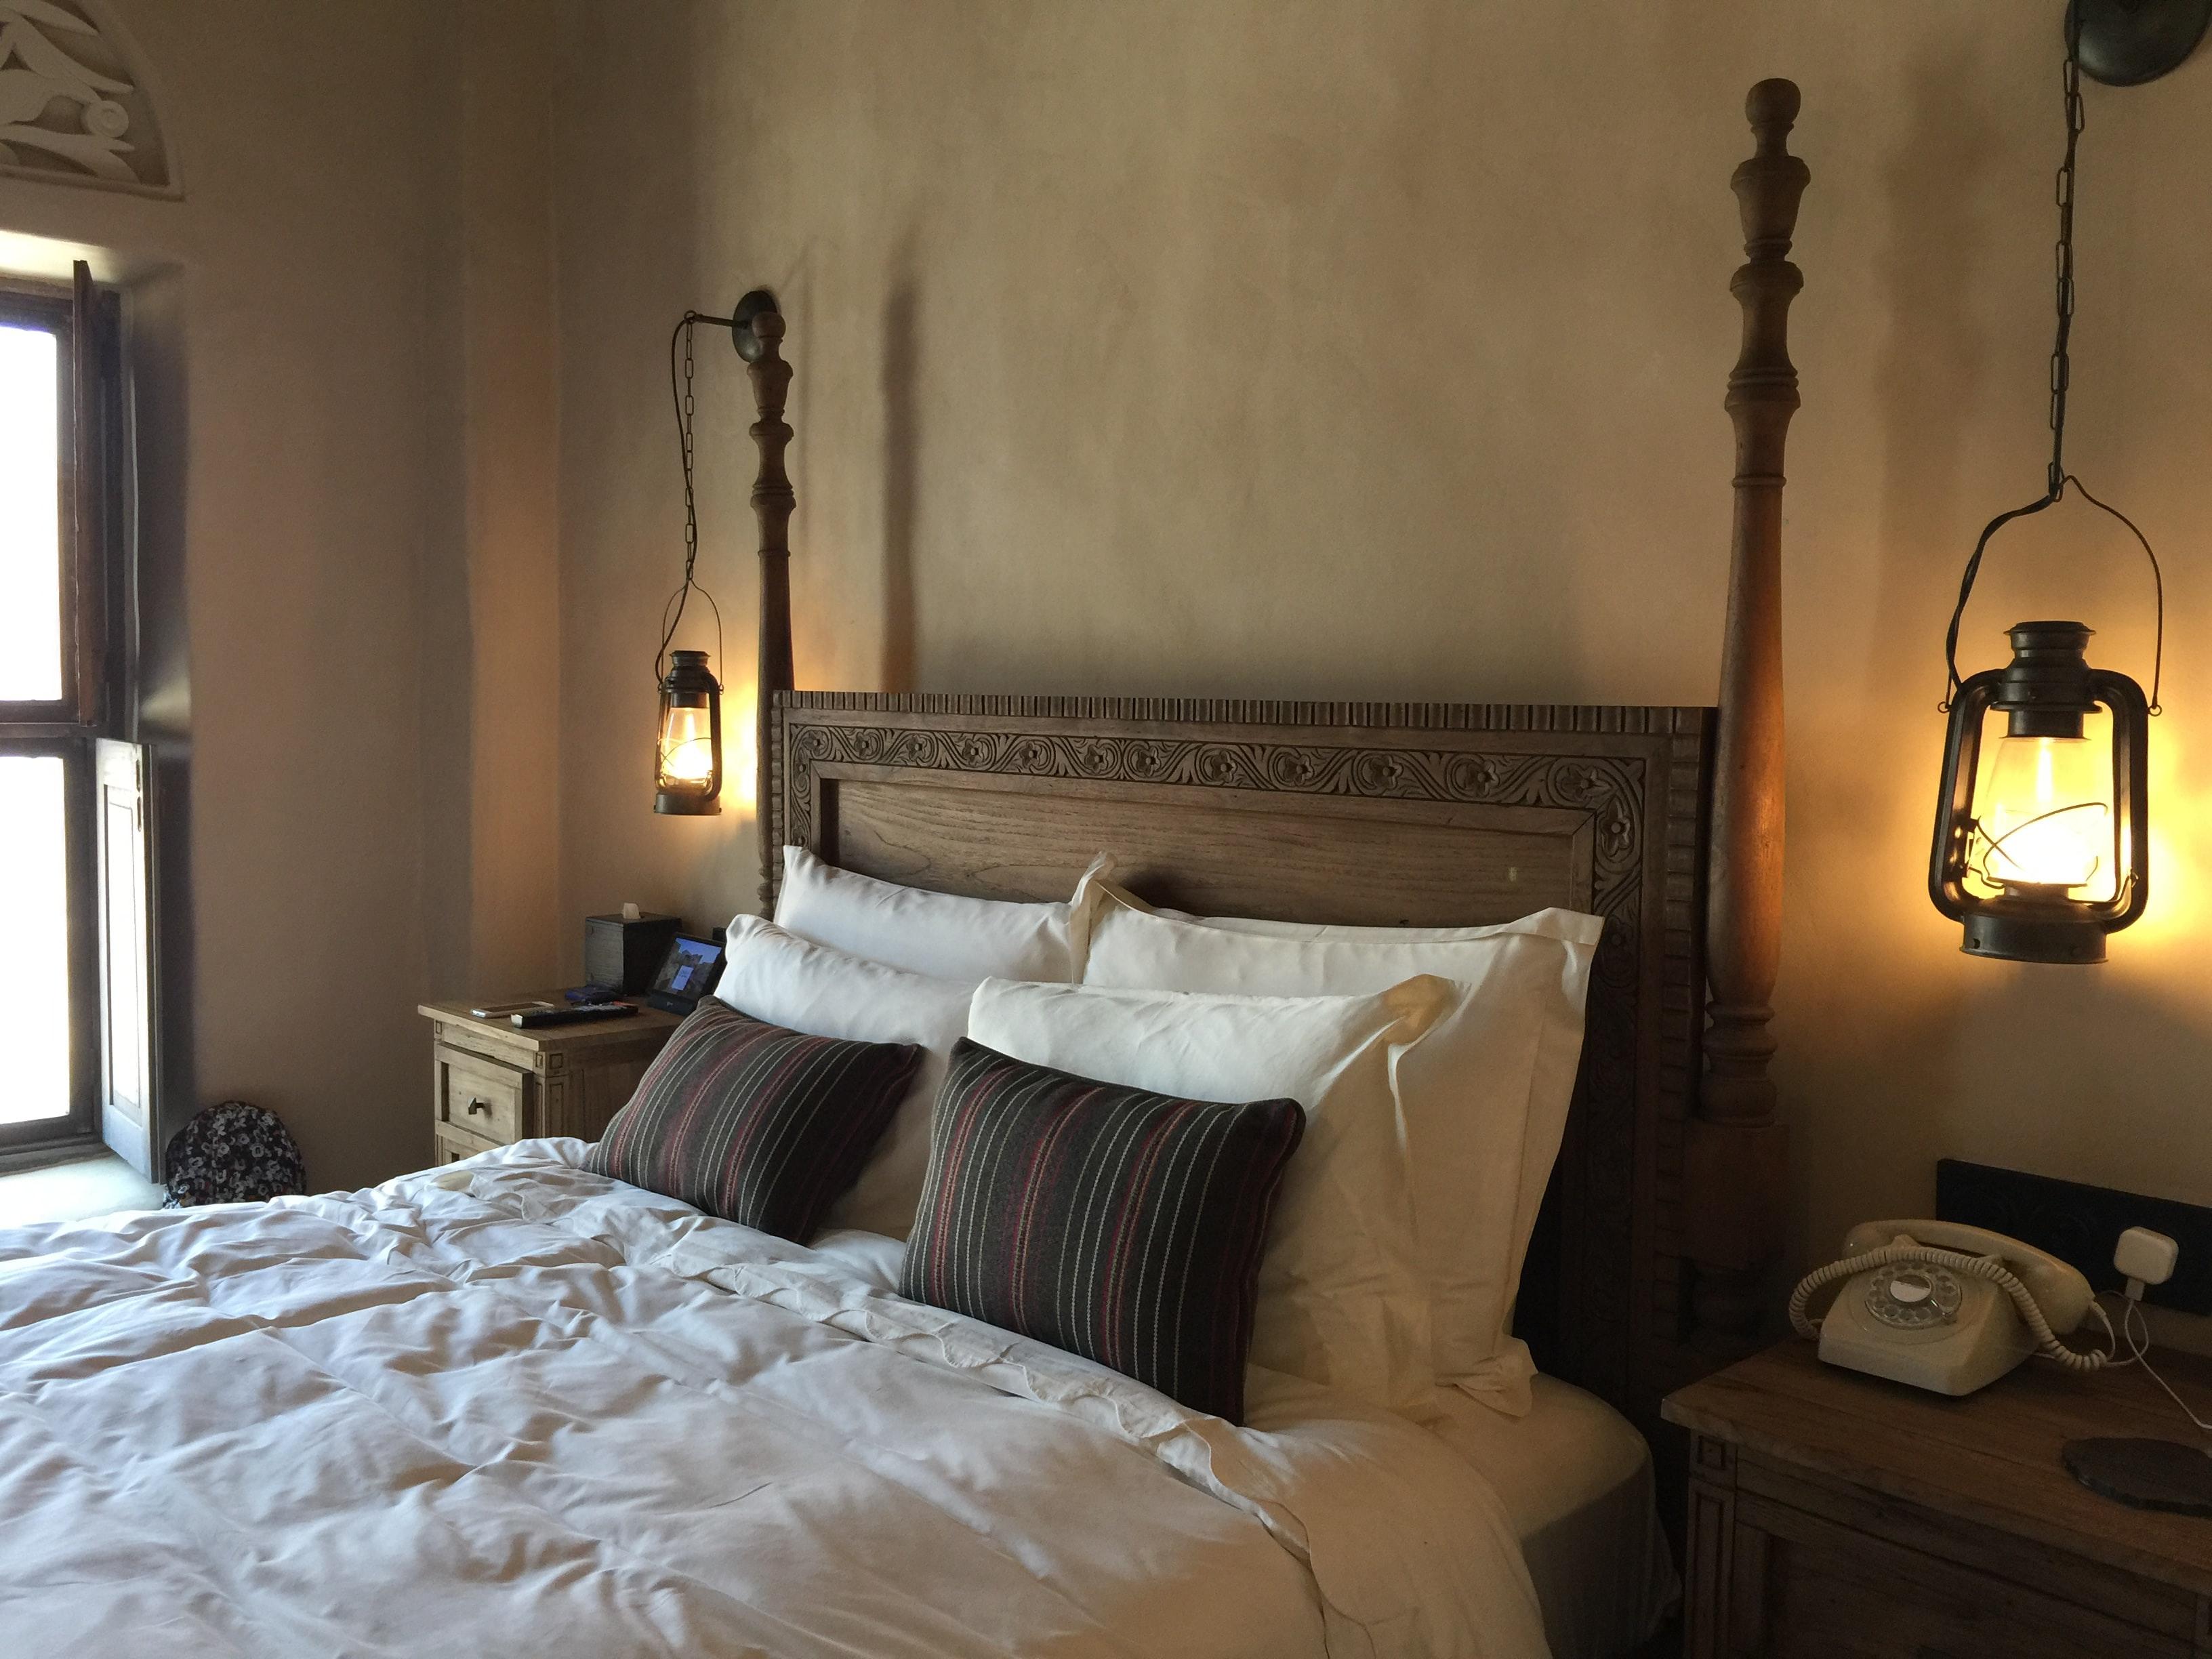 Albergo Sextantio Le Grotte Della Civita, Cave Hotel, Italy, Honeymoon in Italy Travel Guide